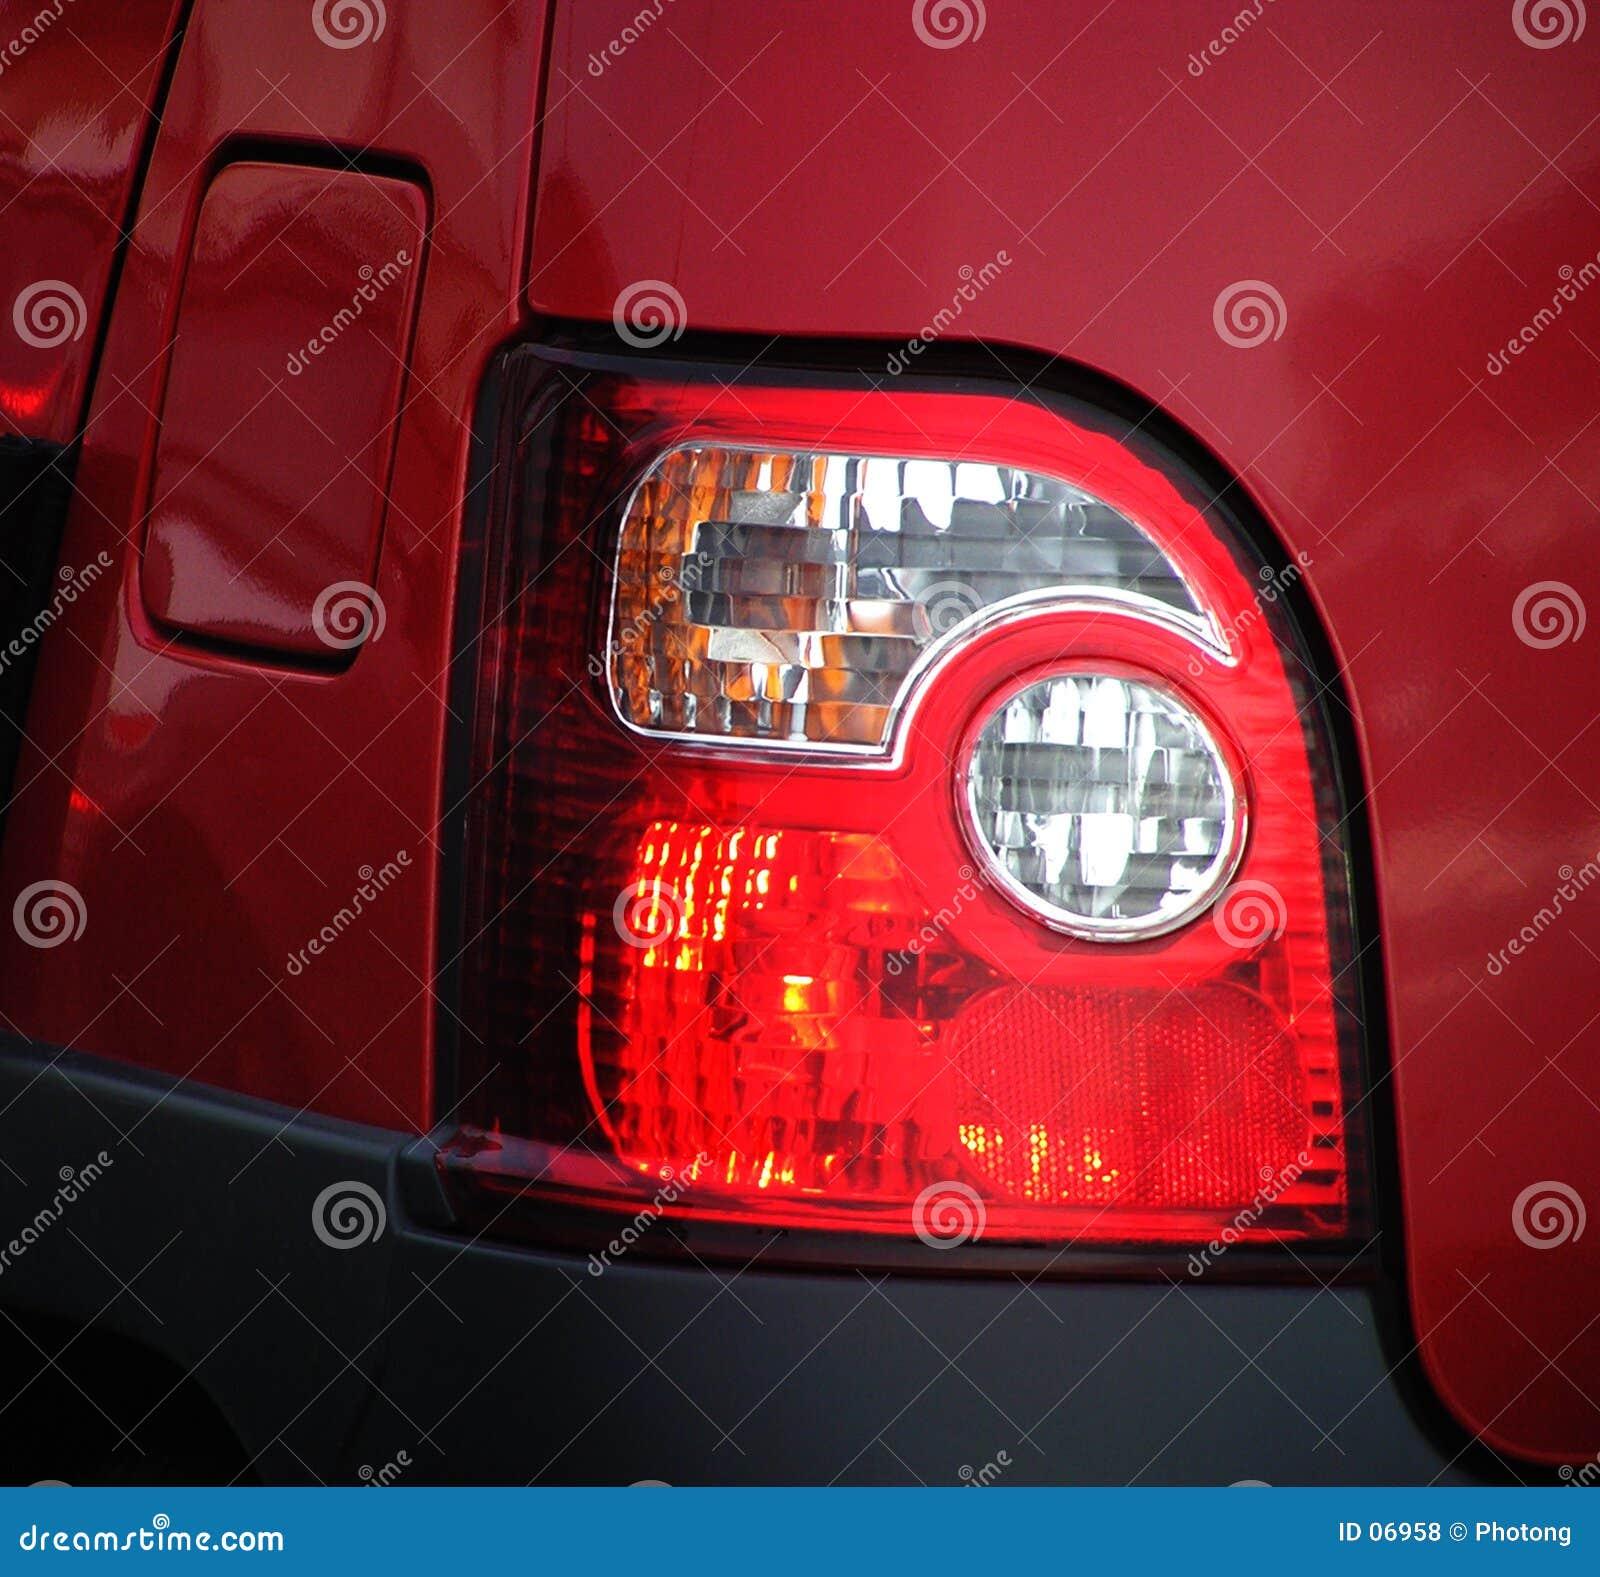 Indicatori luminosi di freno posteriore